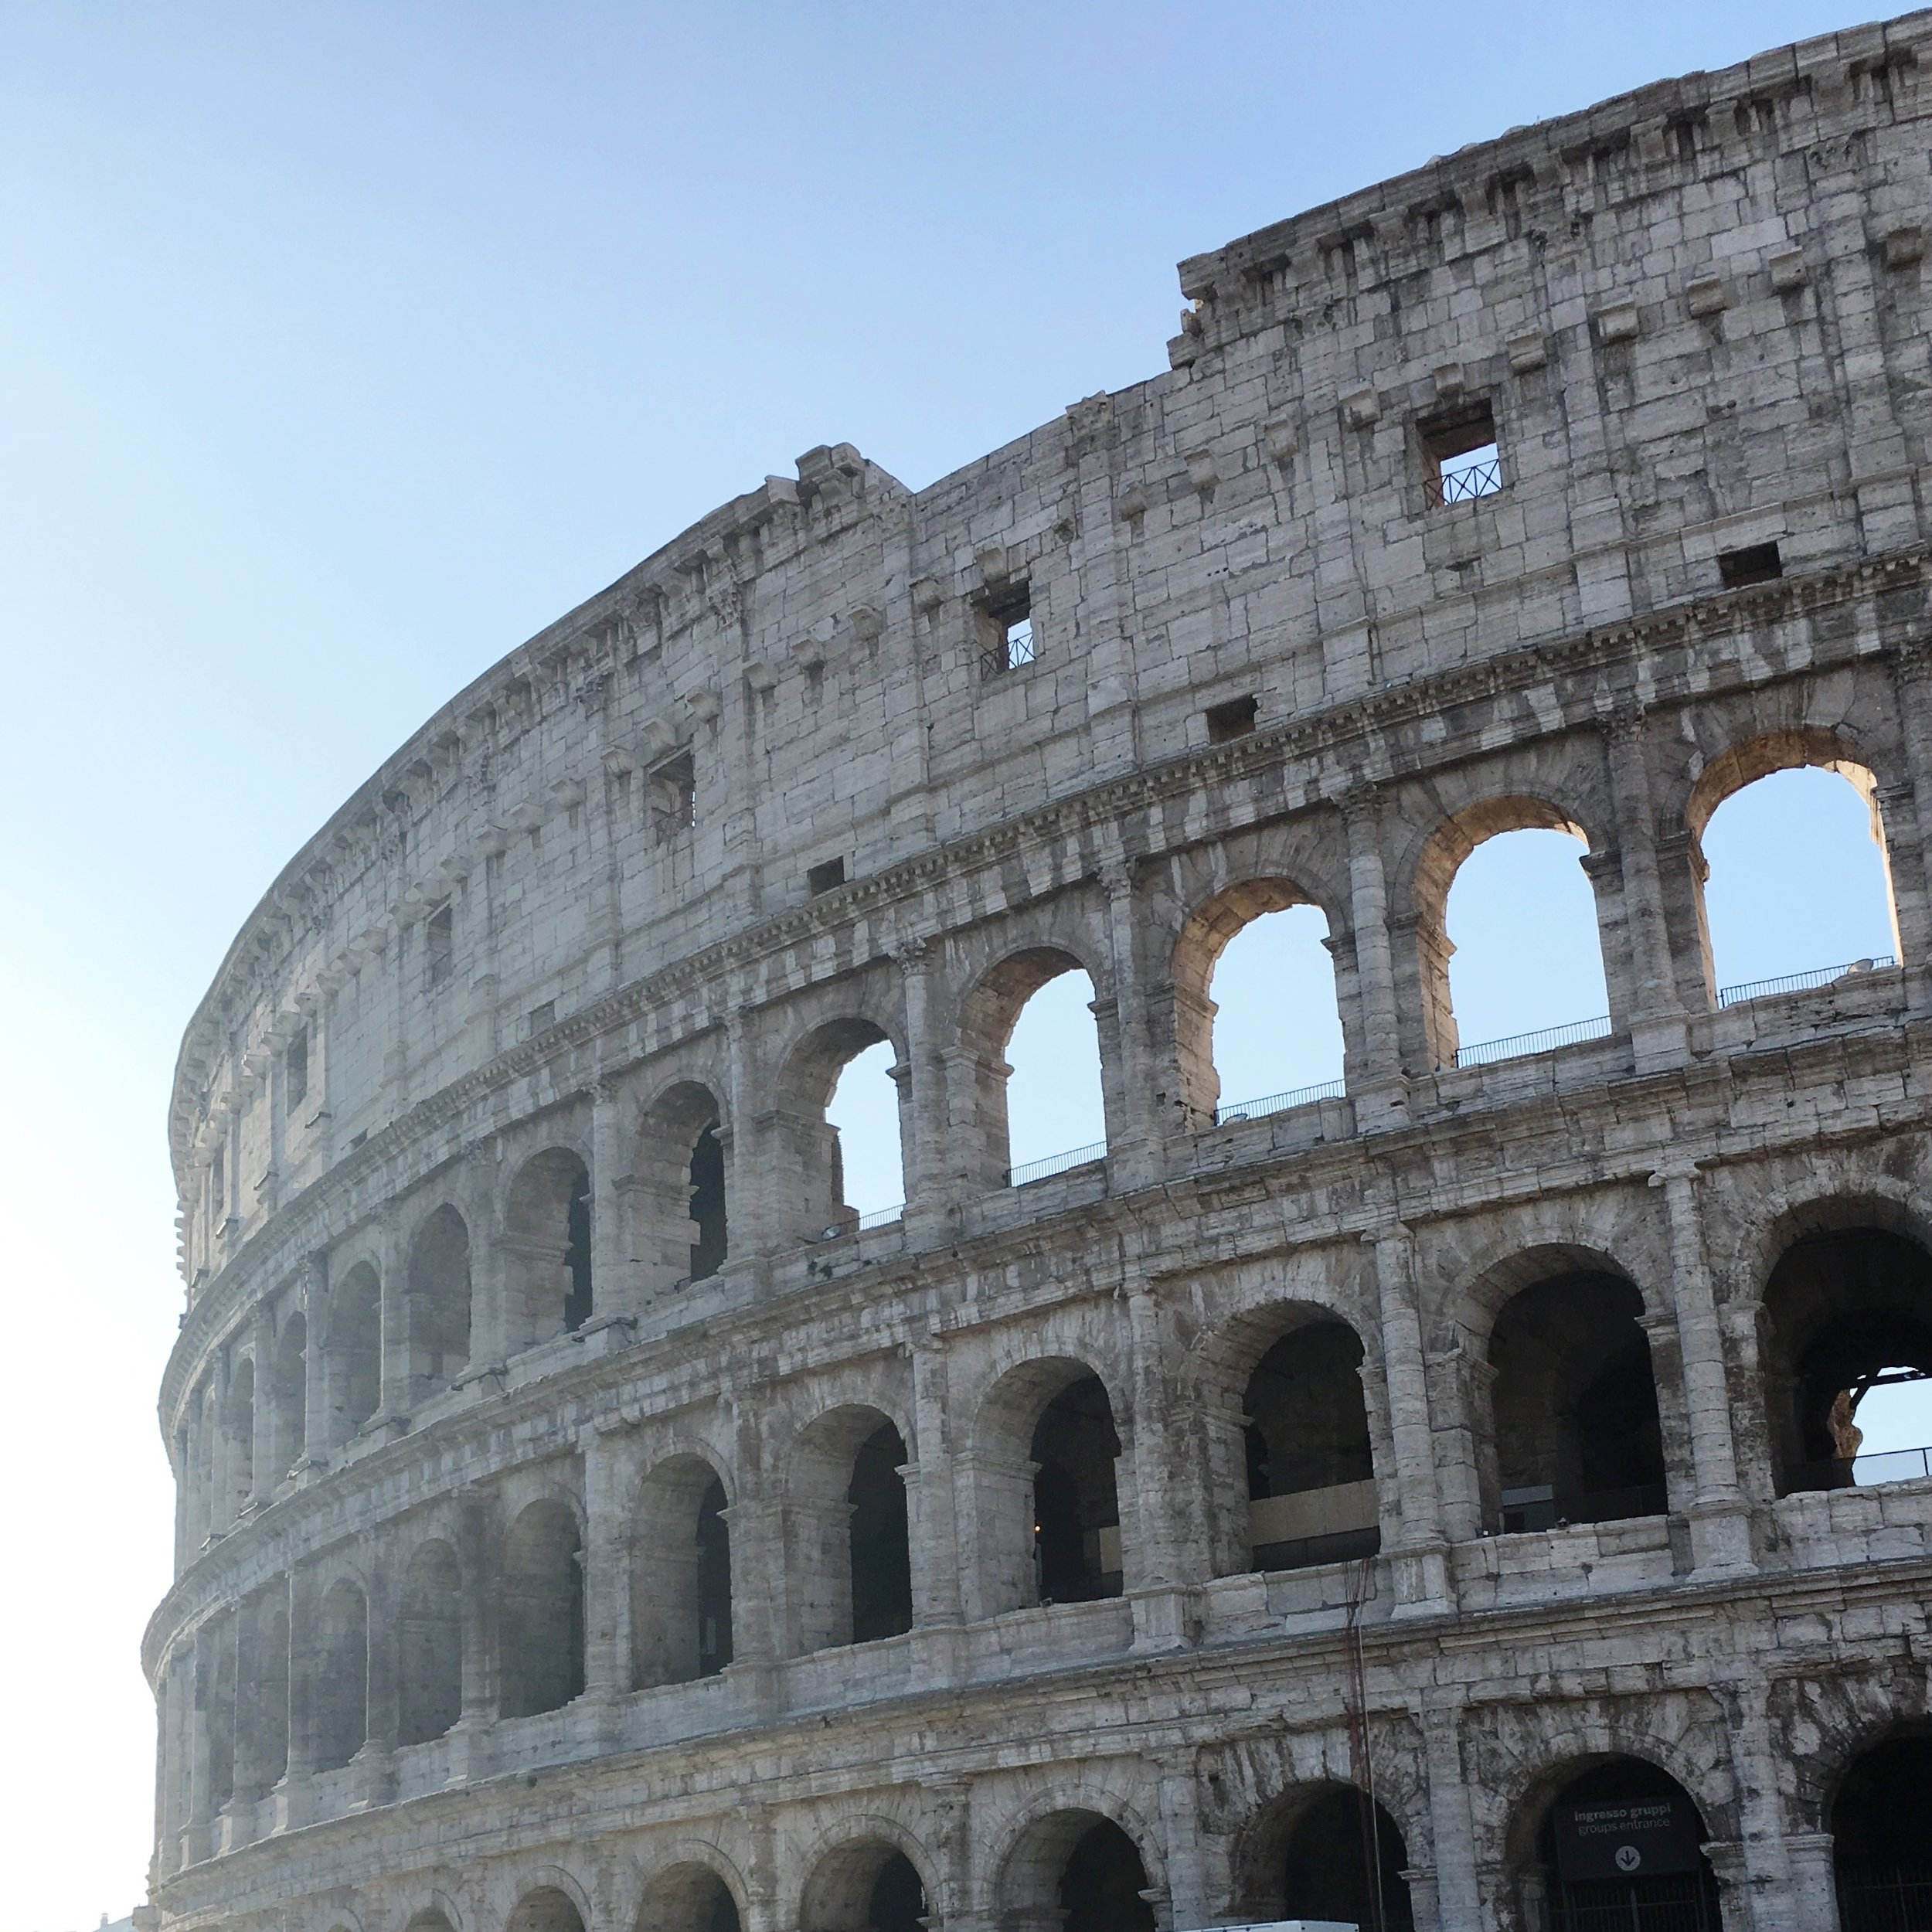 Italy on meethaha.com